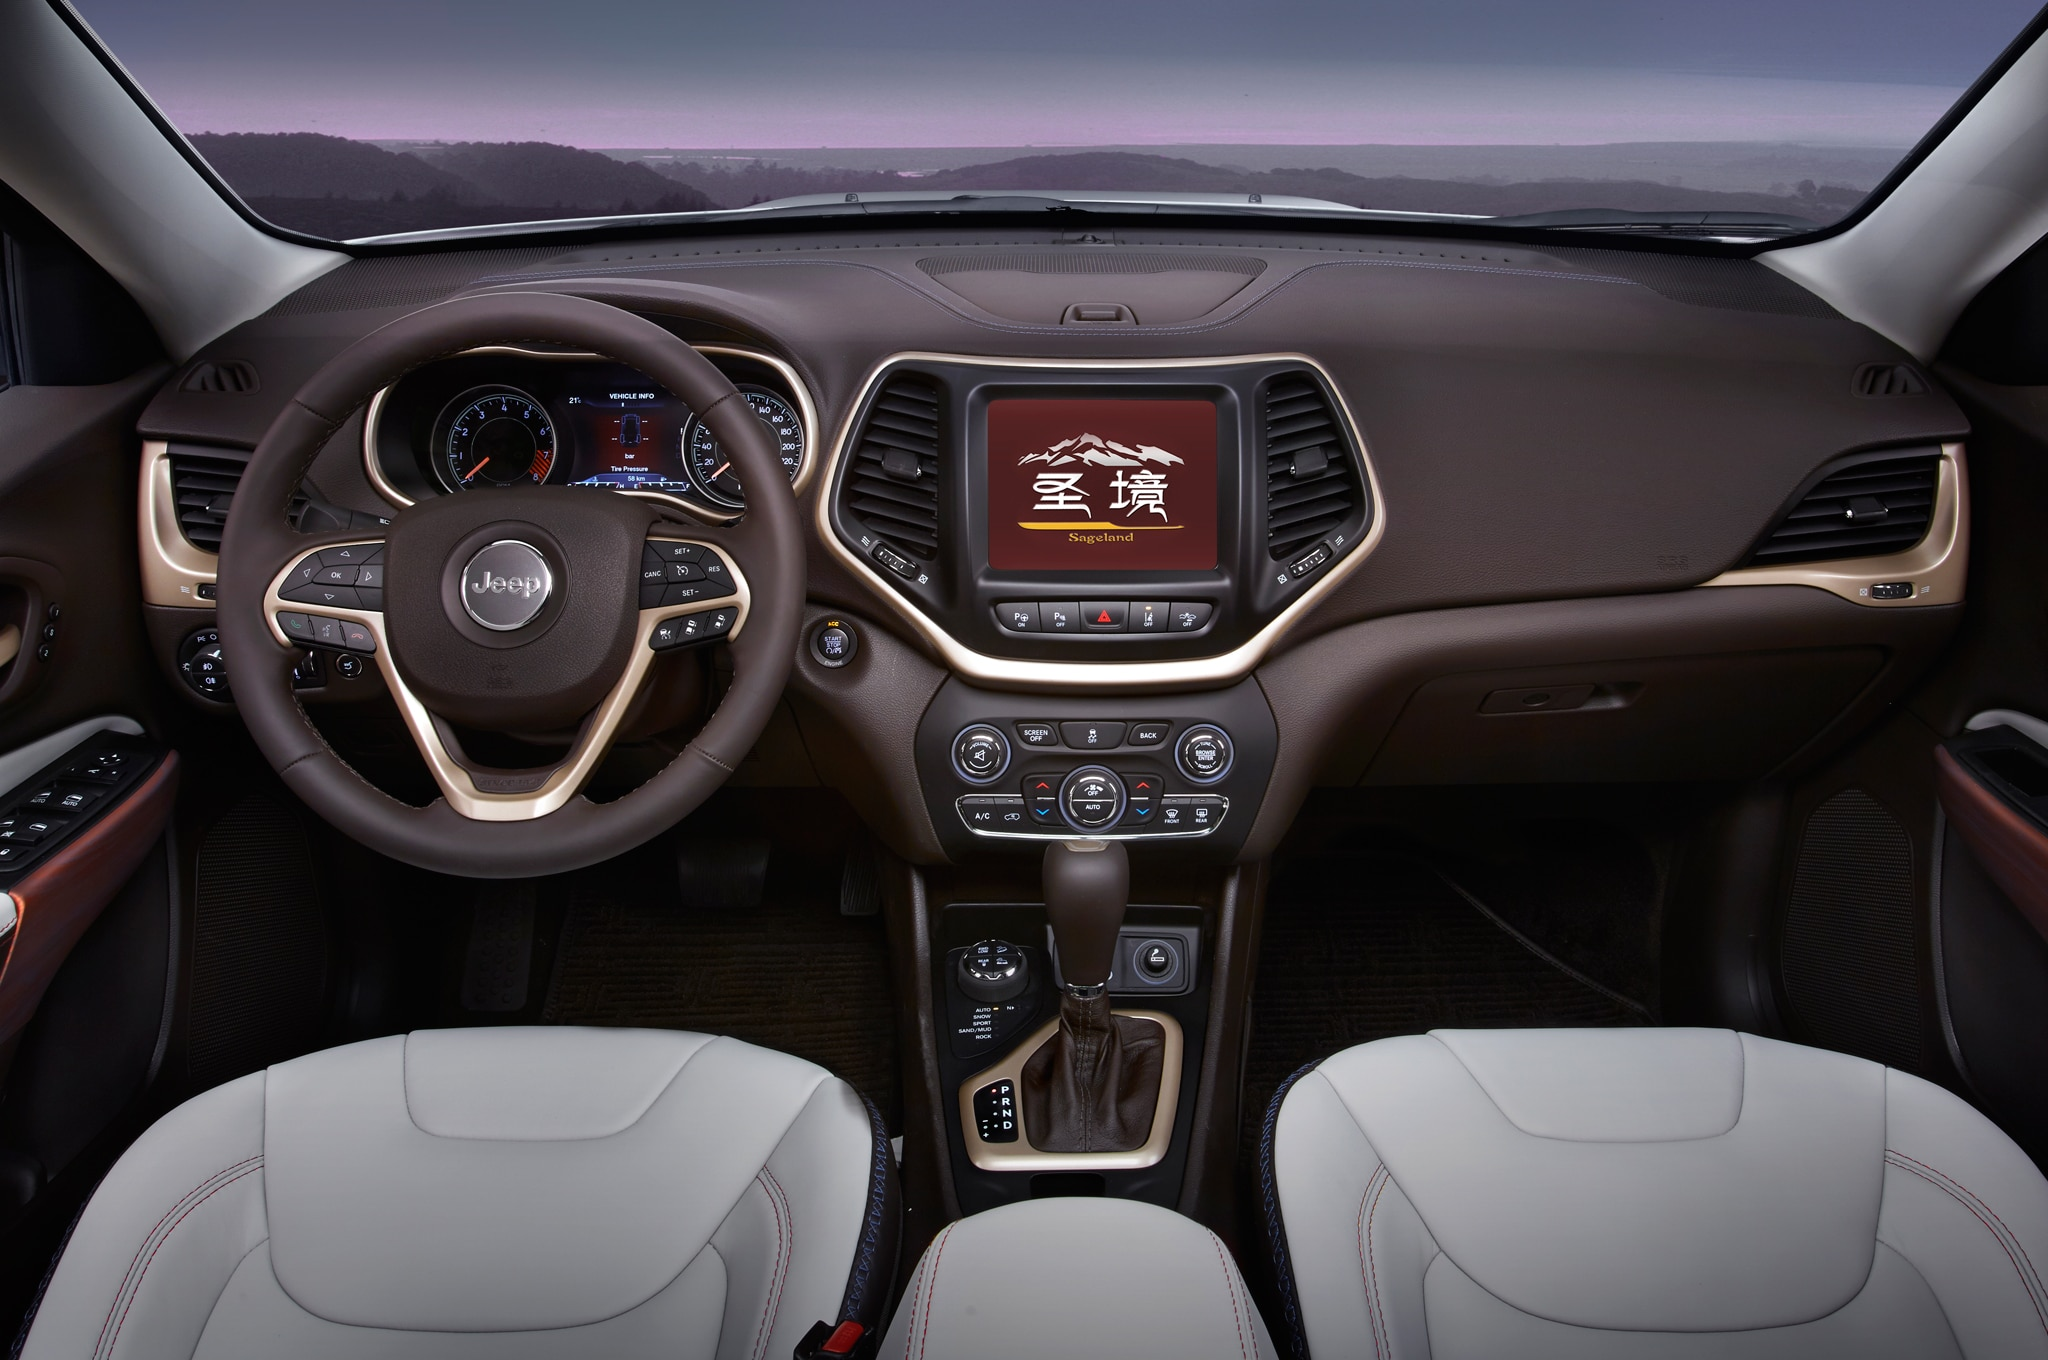 Jeep unveils four new concepts at beijing auto show for M concept interior design